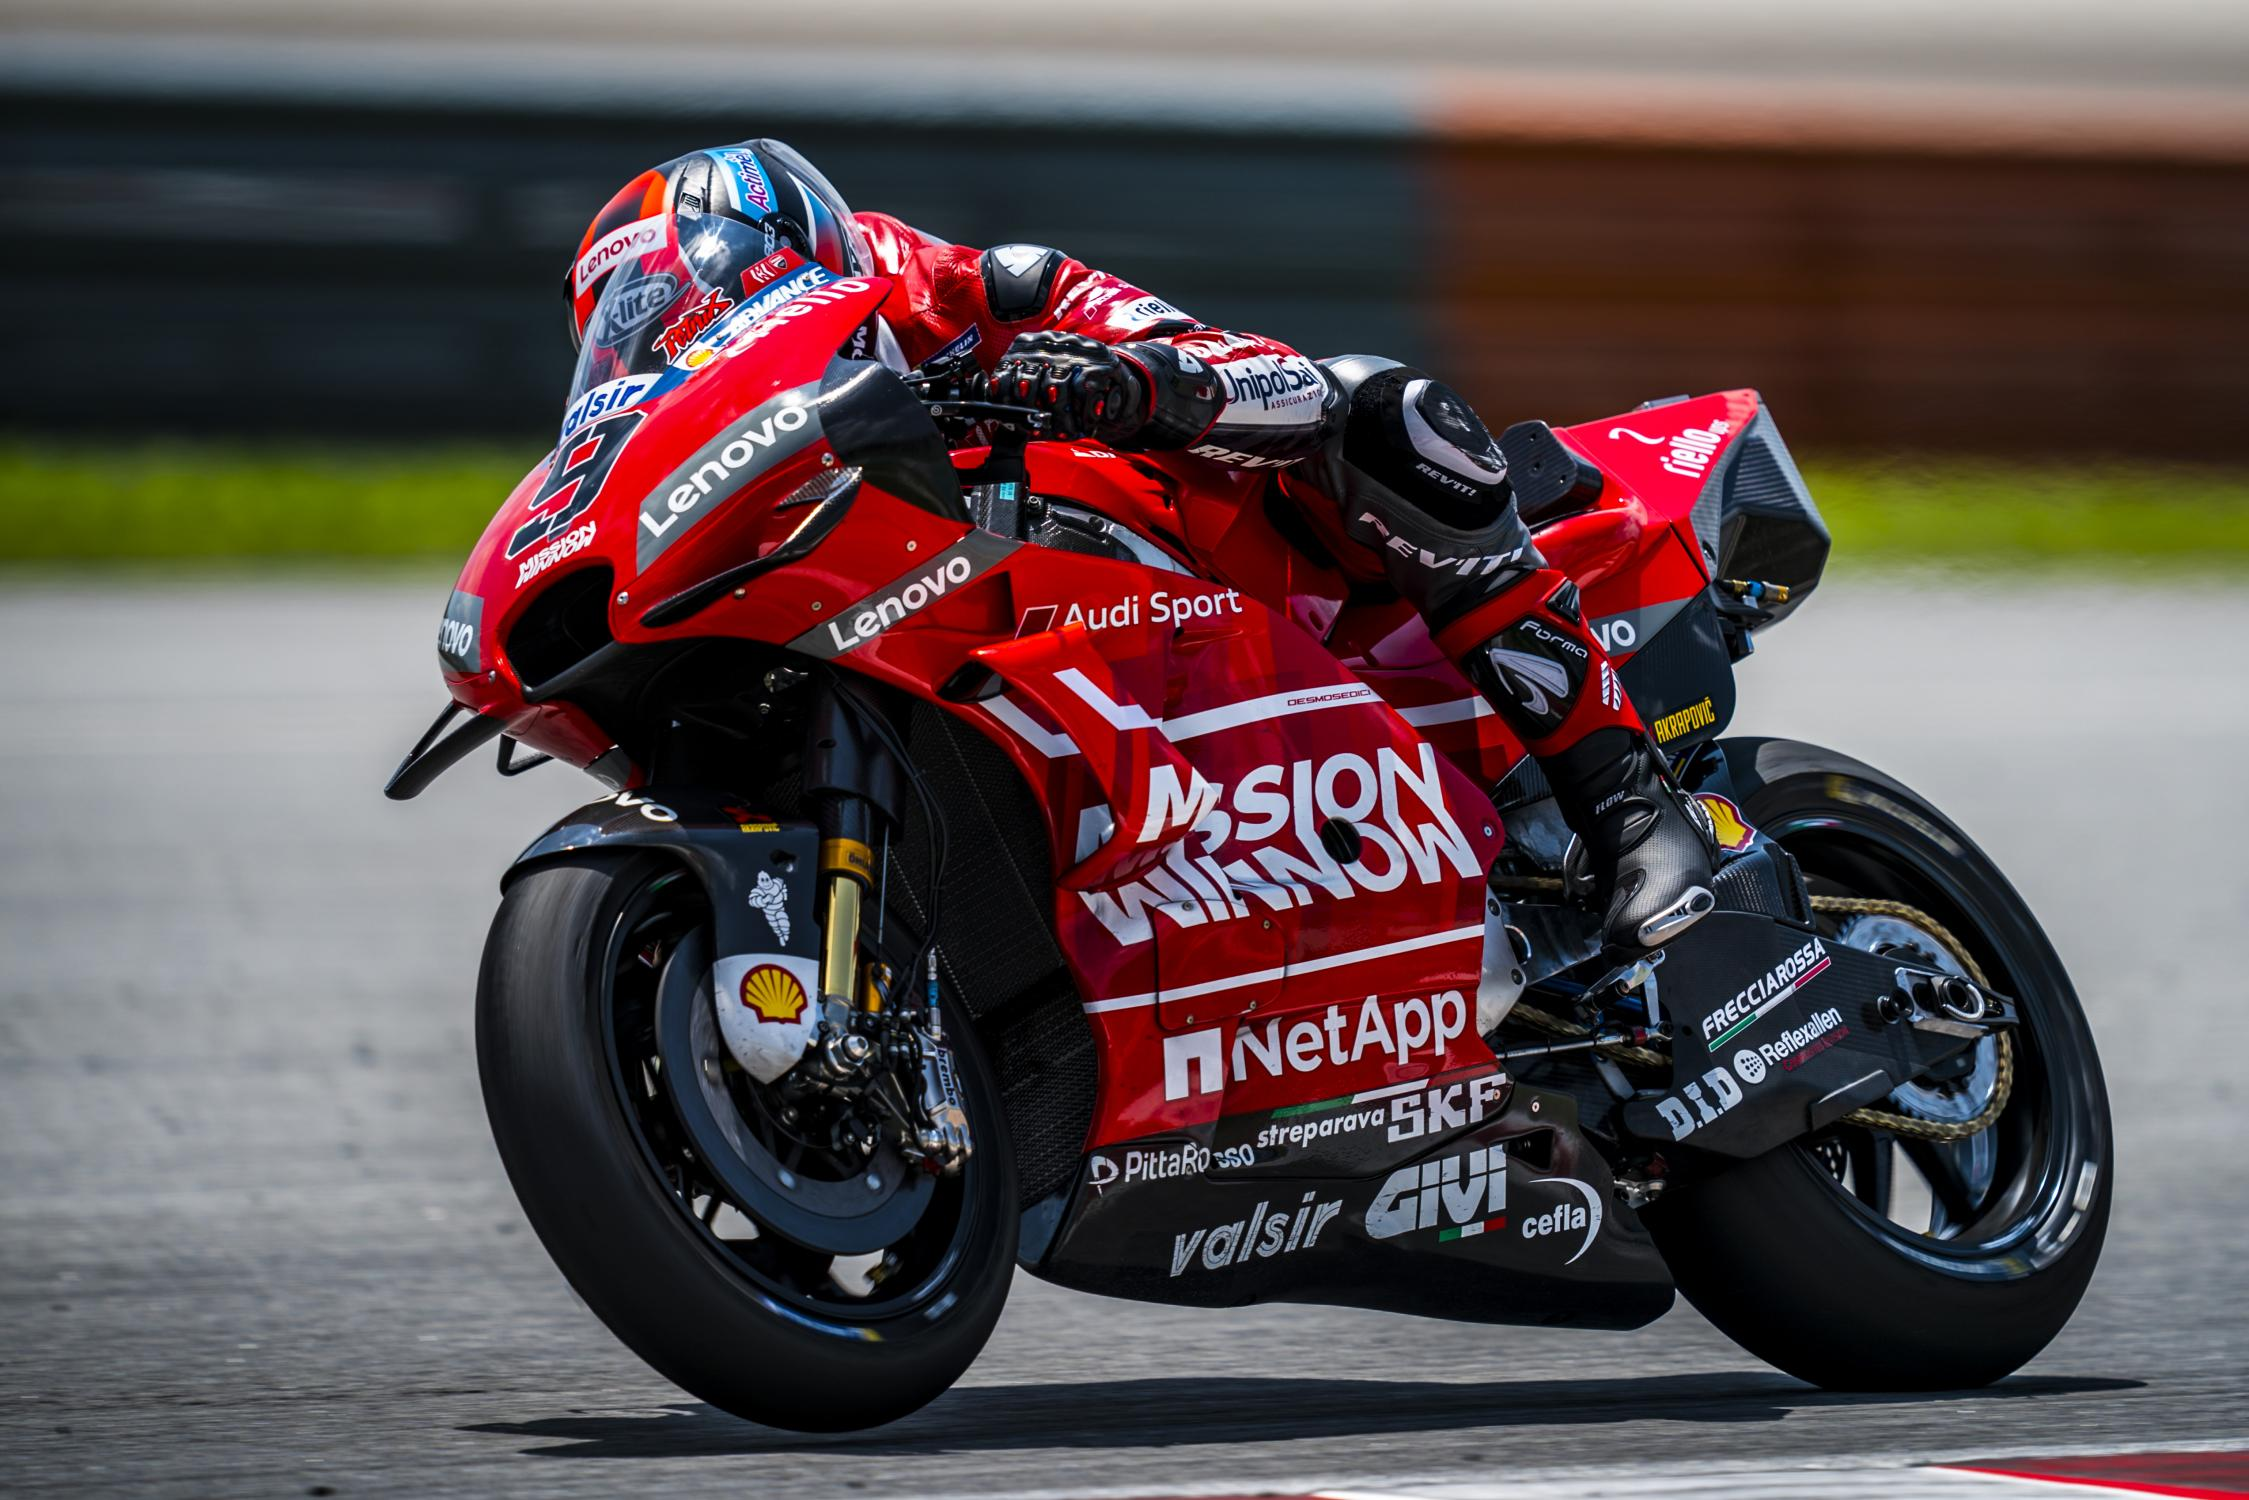 Výsledky 3. dne testu MotoGP v Sepangu